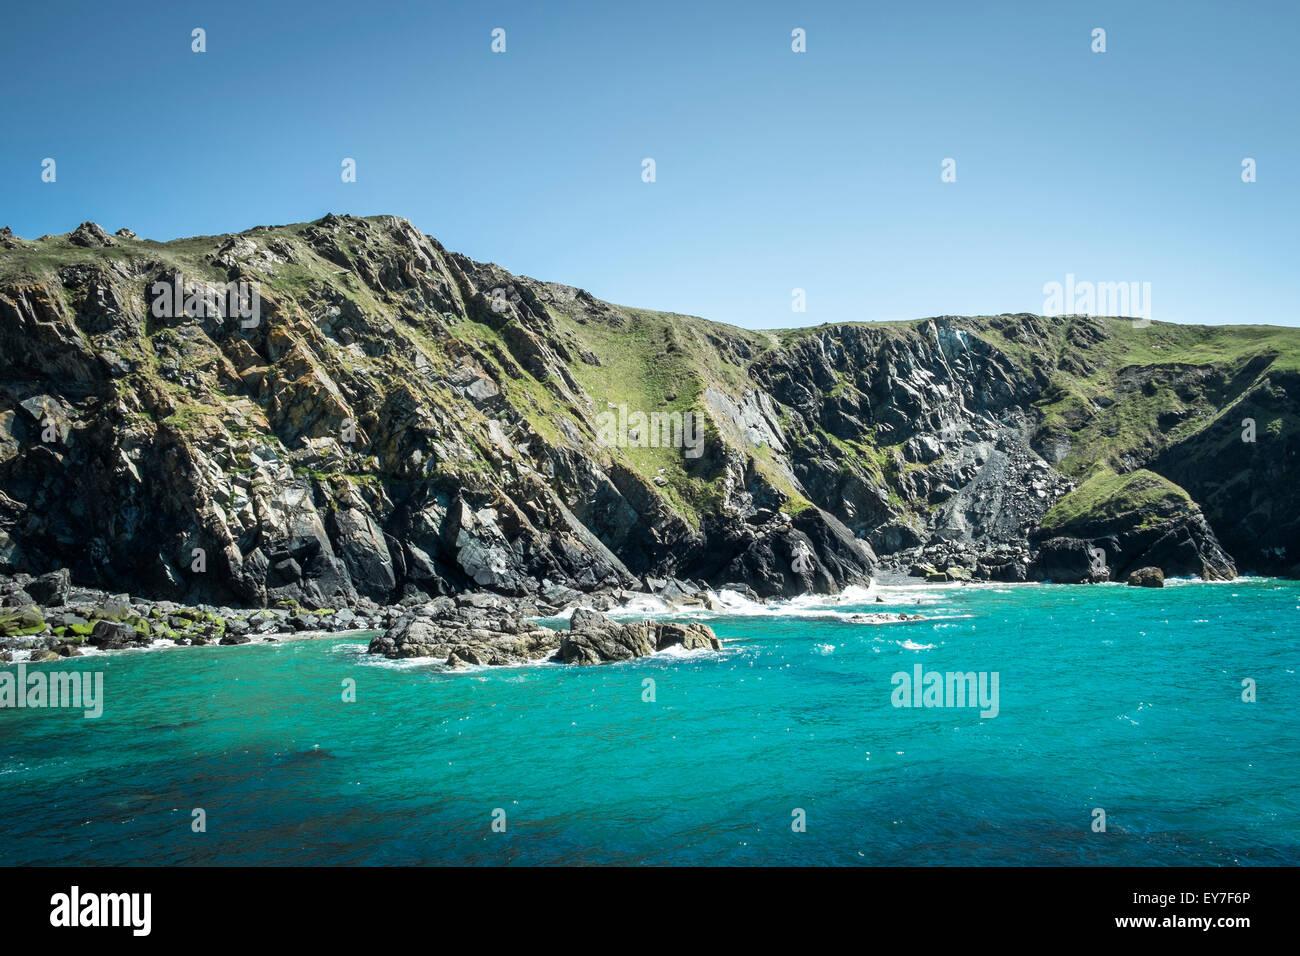 Cabecero y acantilados de Mainel Cove, península de Lizard, Cornwall, Inglaterra, Reino Unido. Imagen De Stock